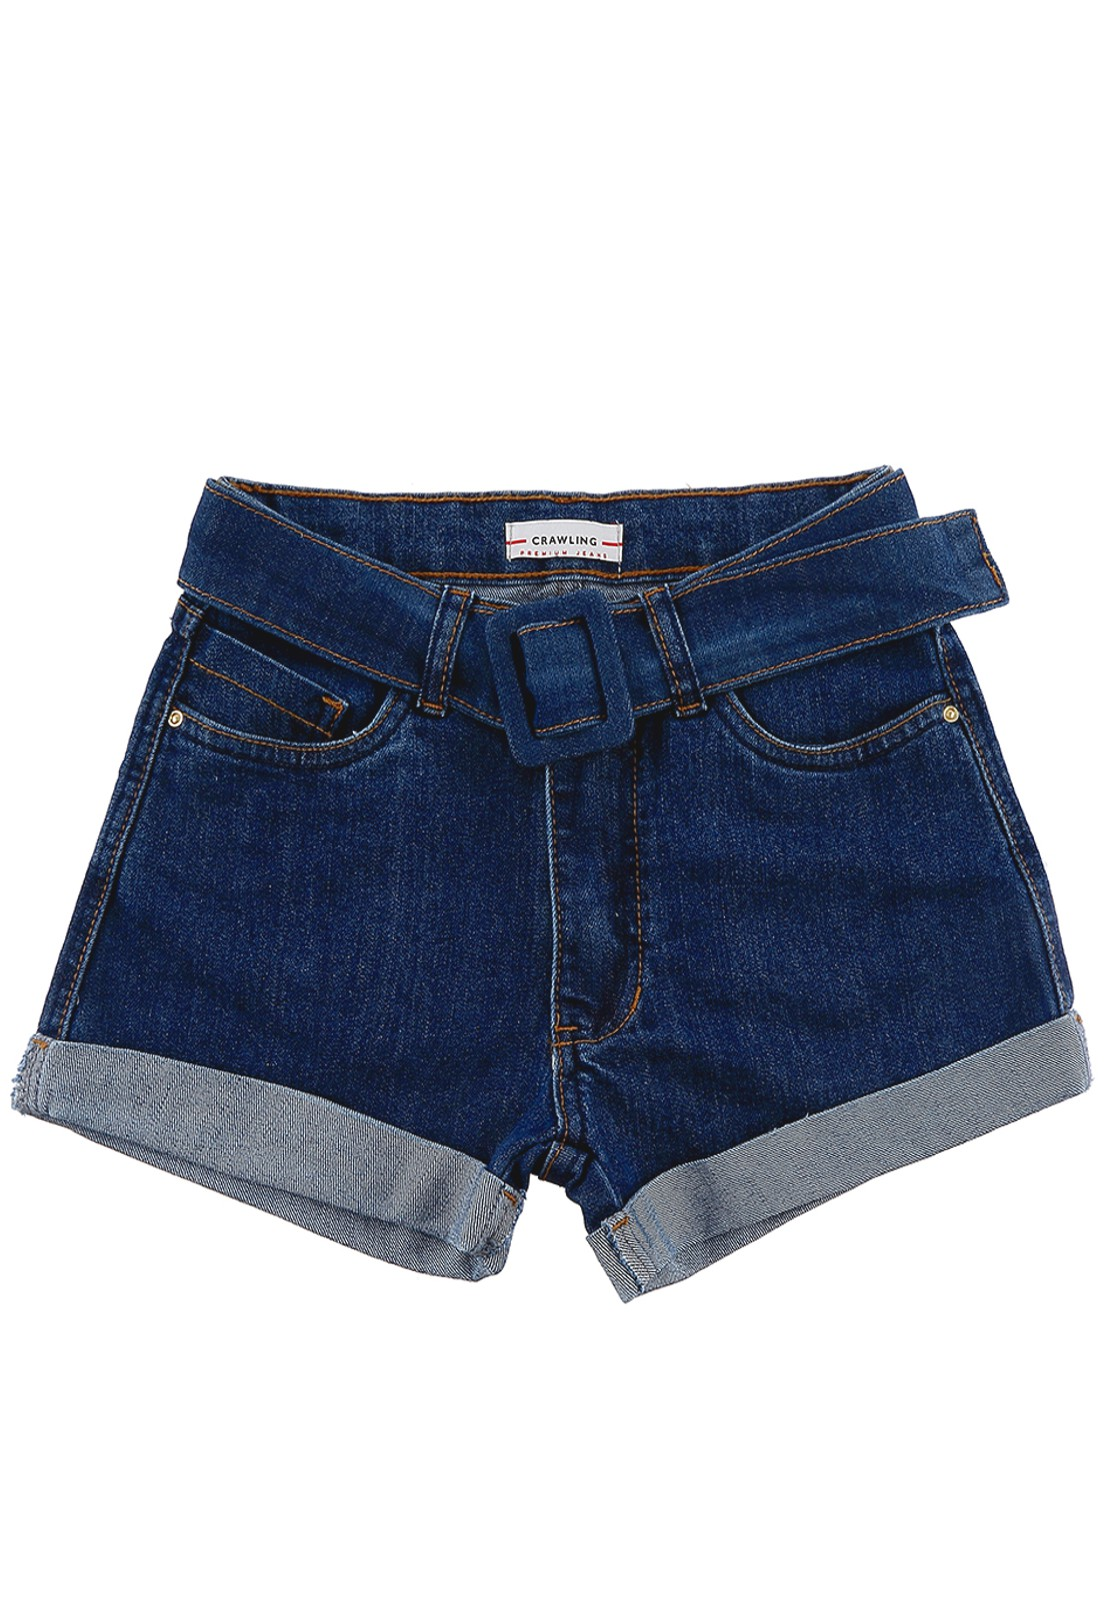 Short Jeans Feminino Crawling C/Cinto